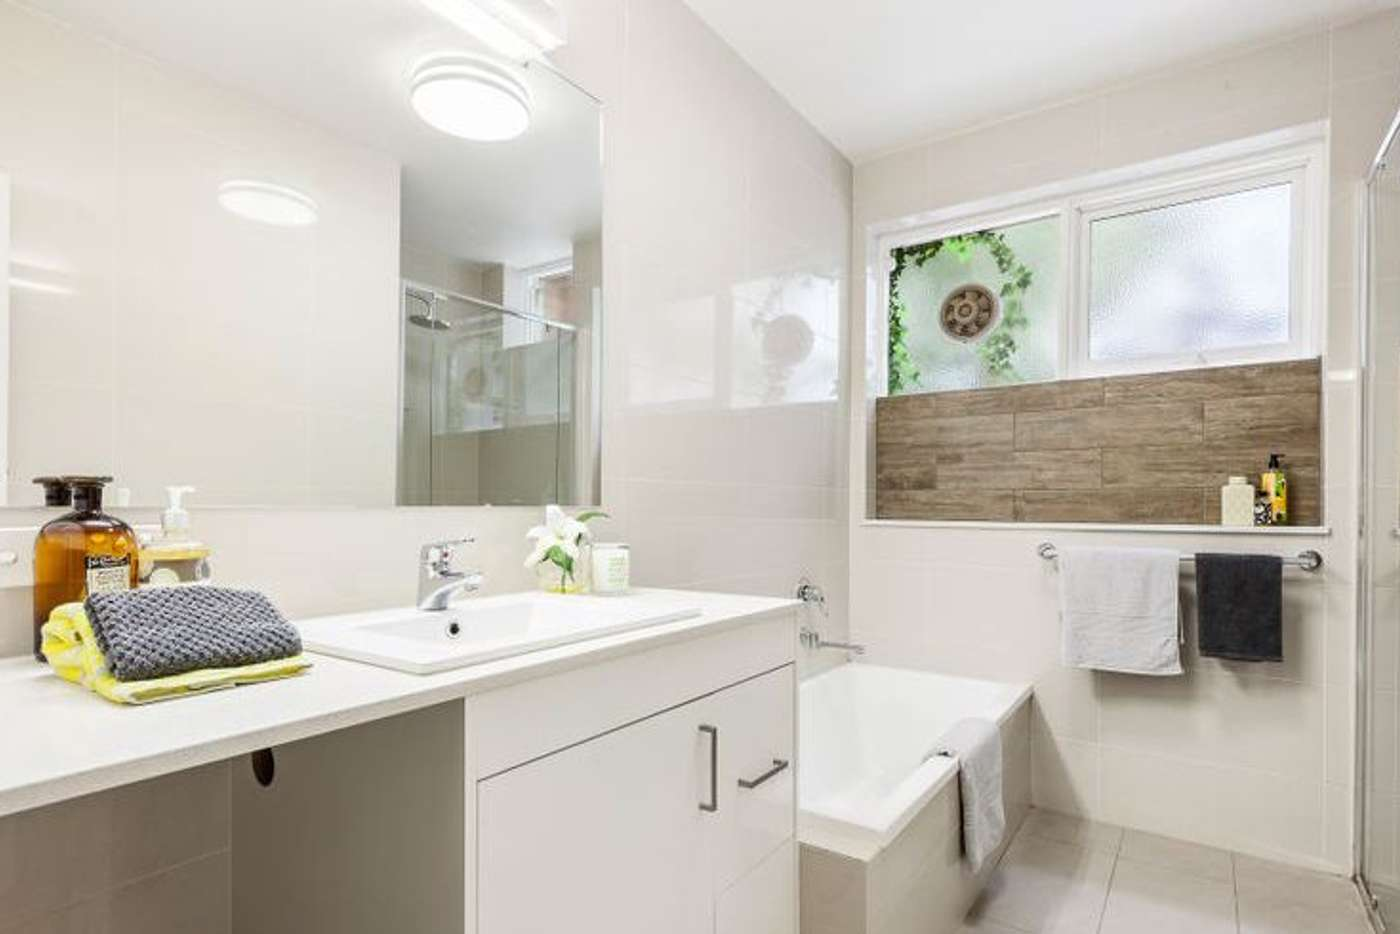 Sixth view of Homely apartment listing, 1/492 Dandenong Road, Caulfield North VIC 3161